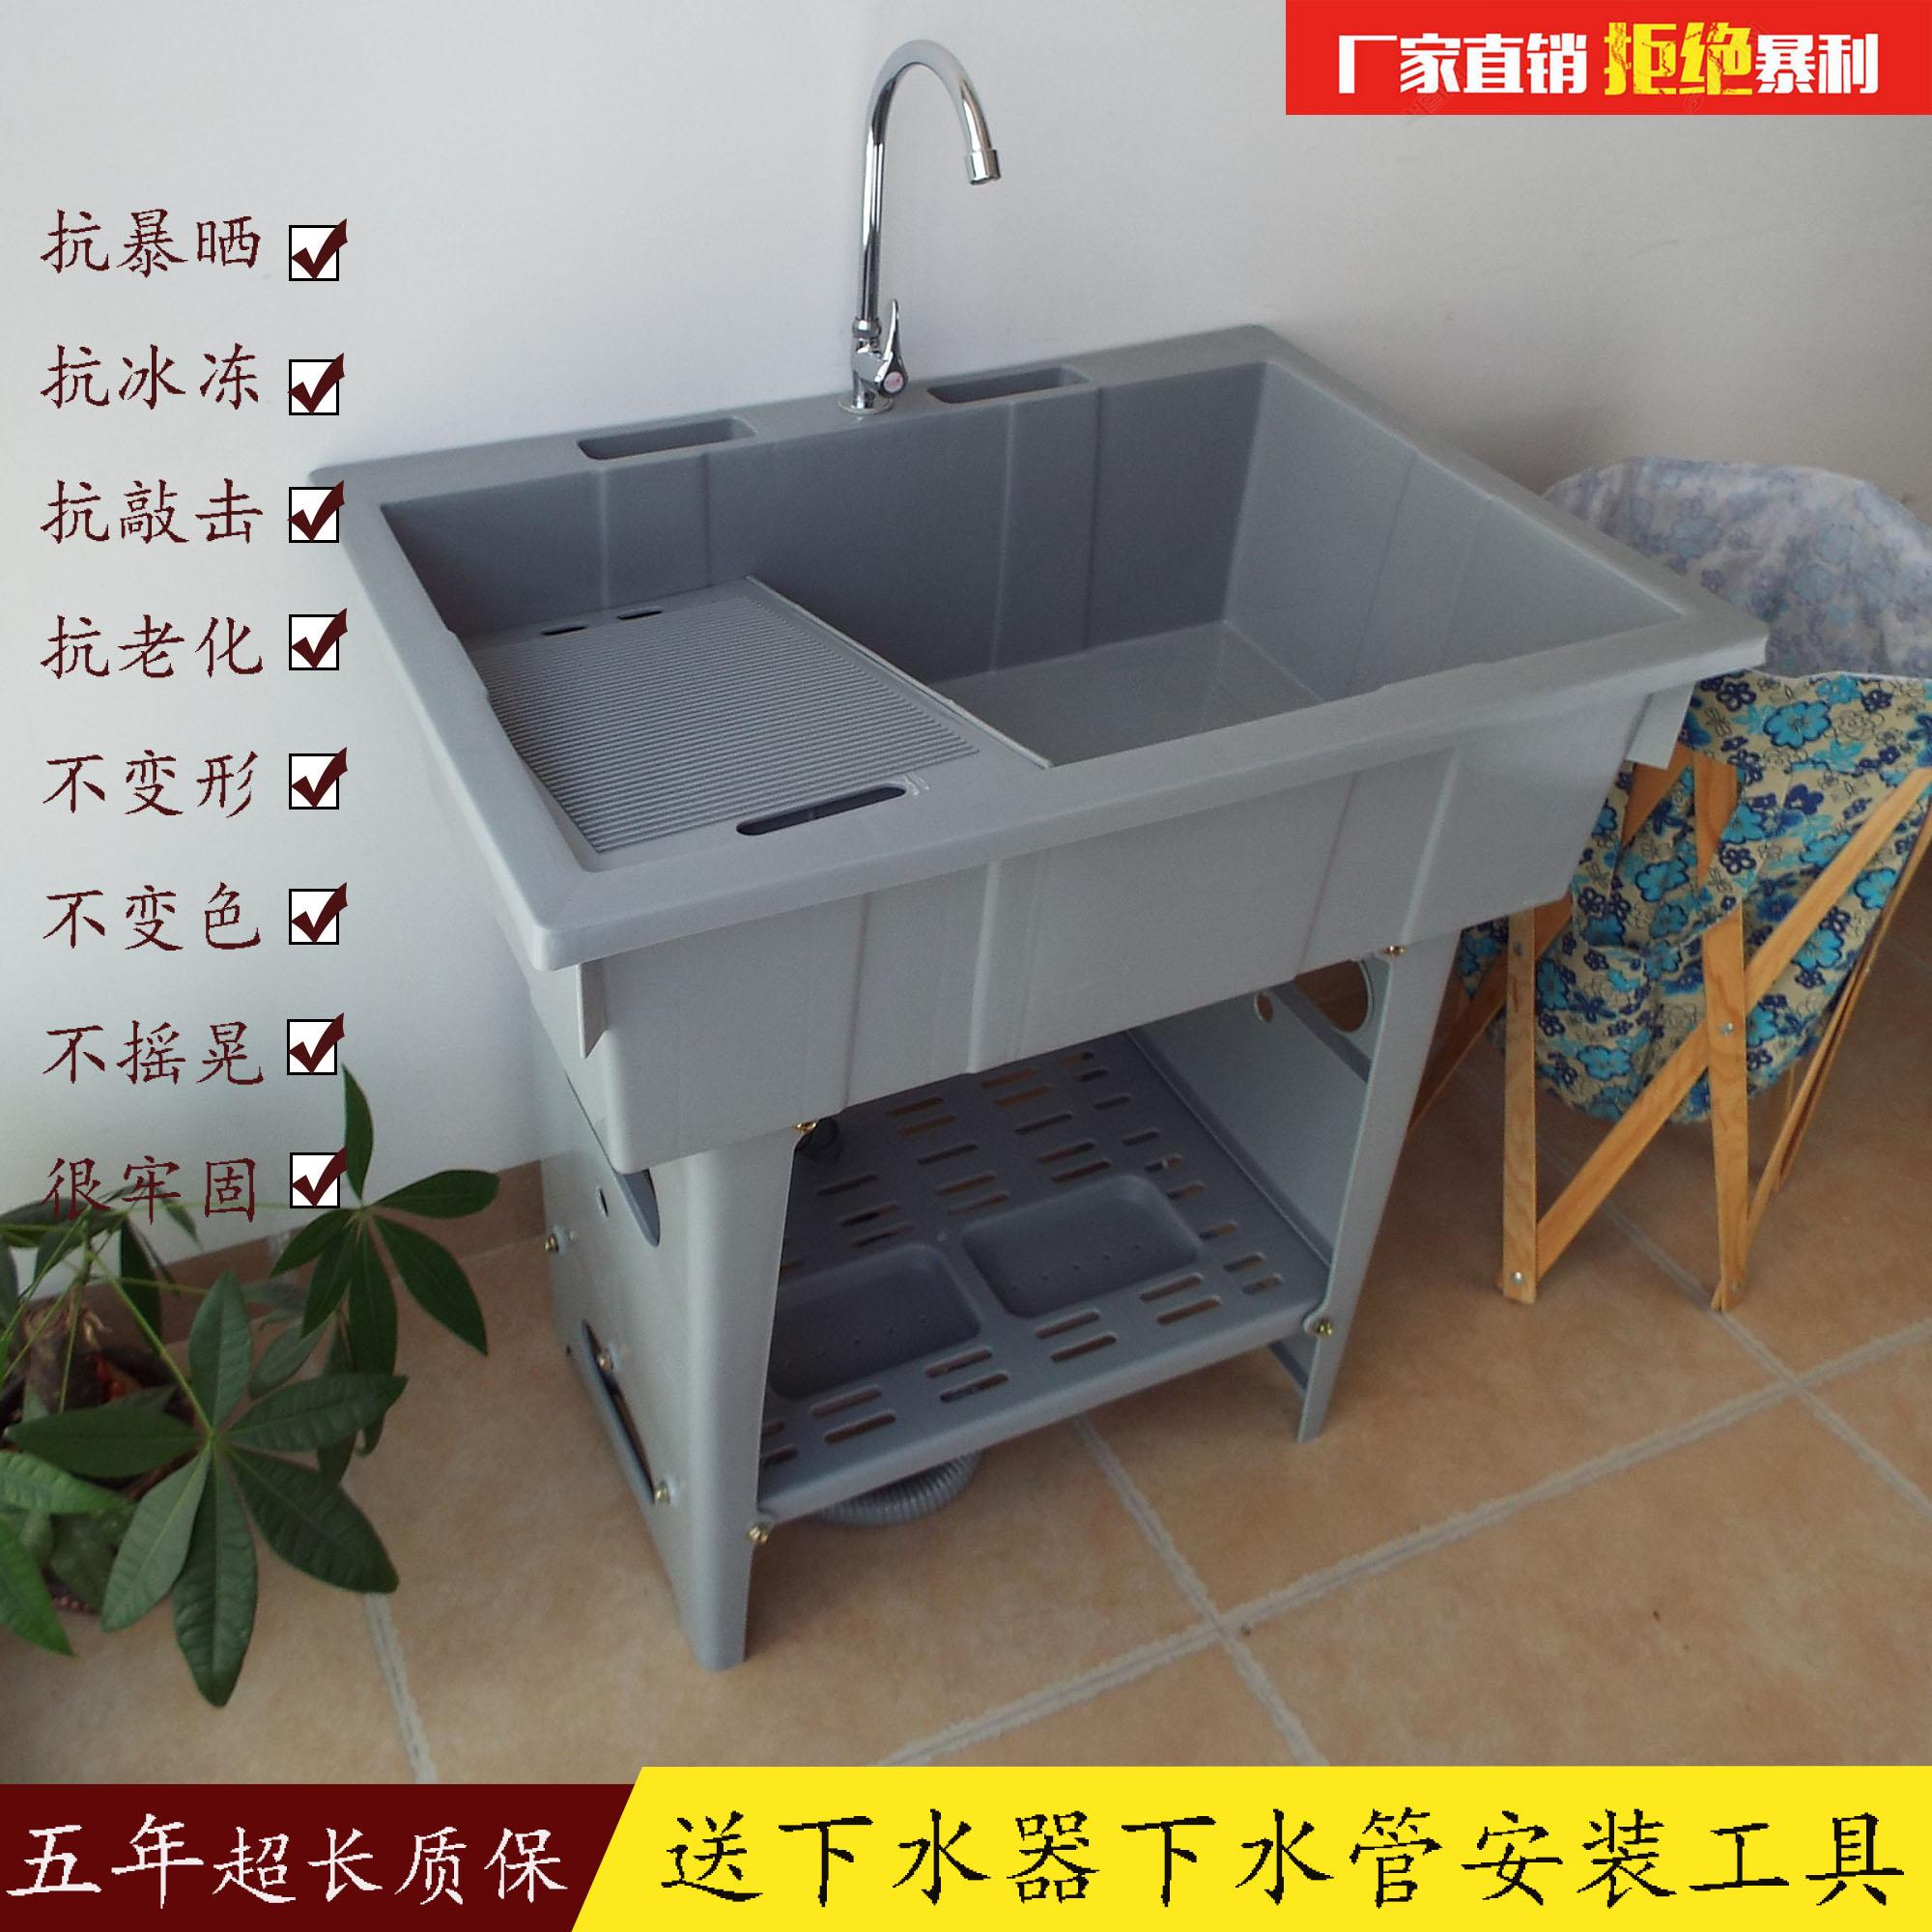 Plastic Laundry Basin Laundry Basin With Scrub Board Balcony Laundry  Cabinet Laundry Basin Laundry Sink Basin With Scrub Board